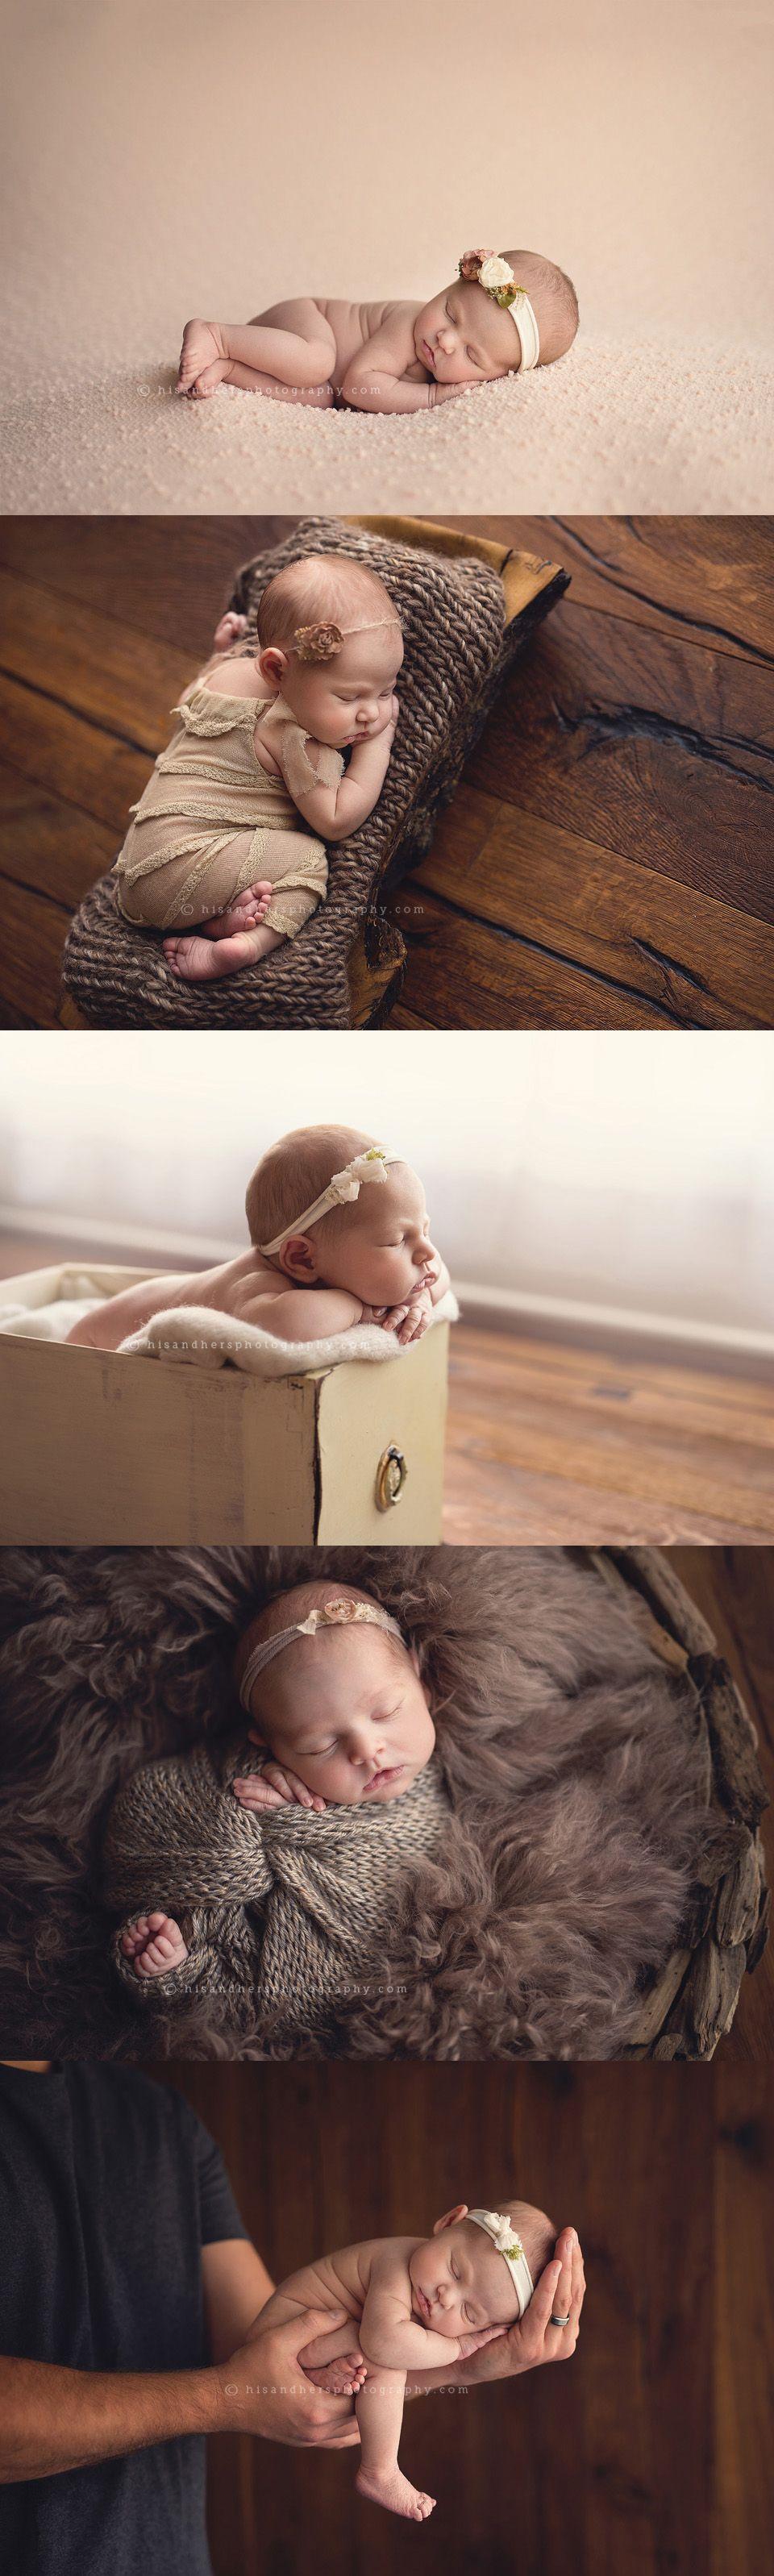 newborn photographer des moines iowa baby pictures photography studio